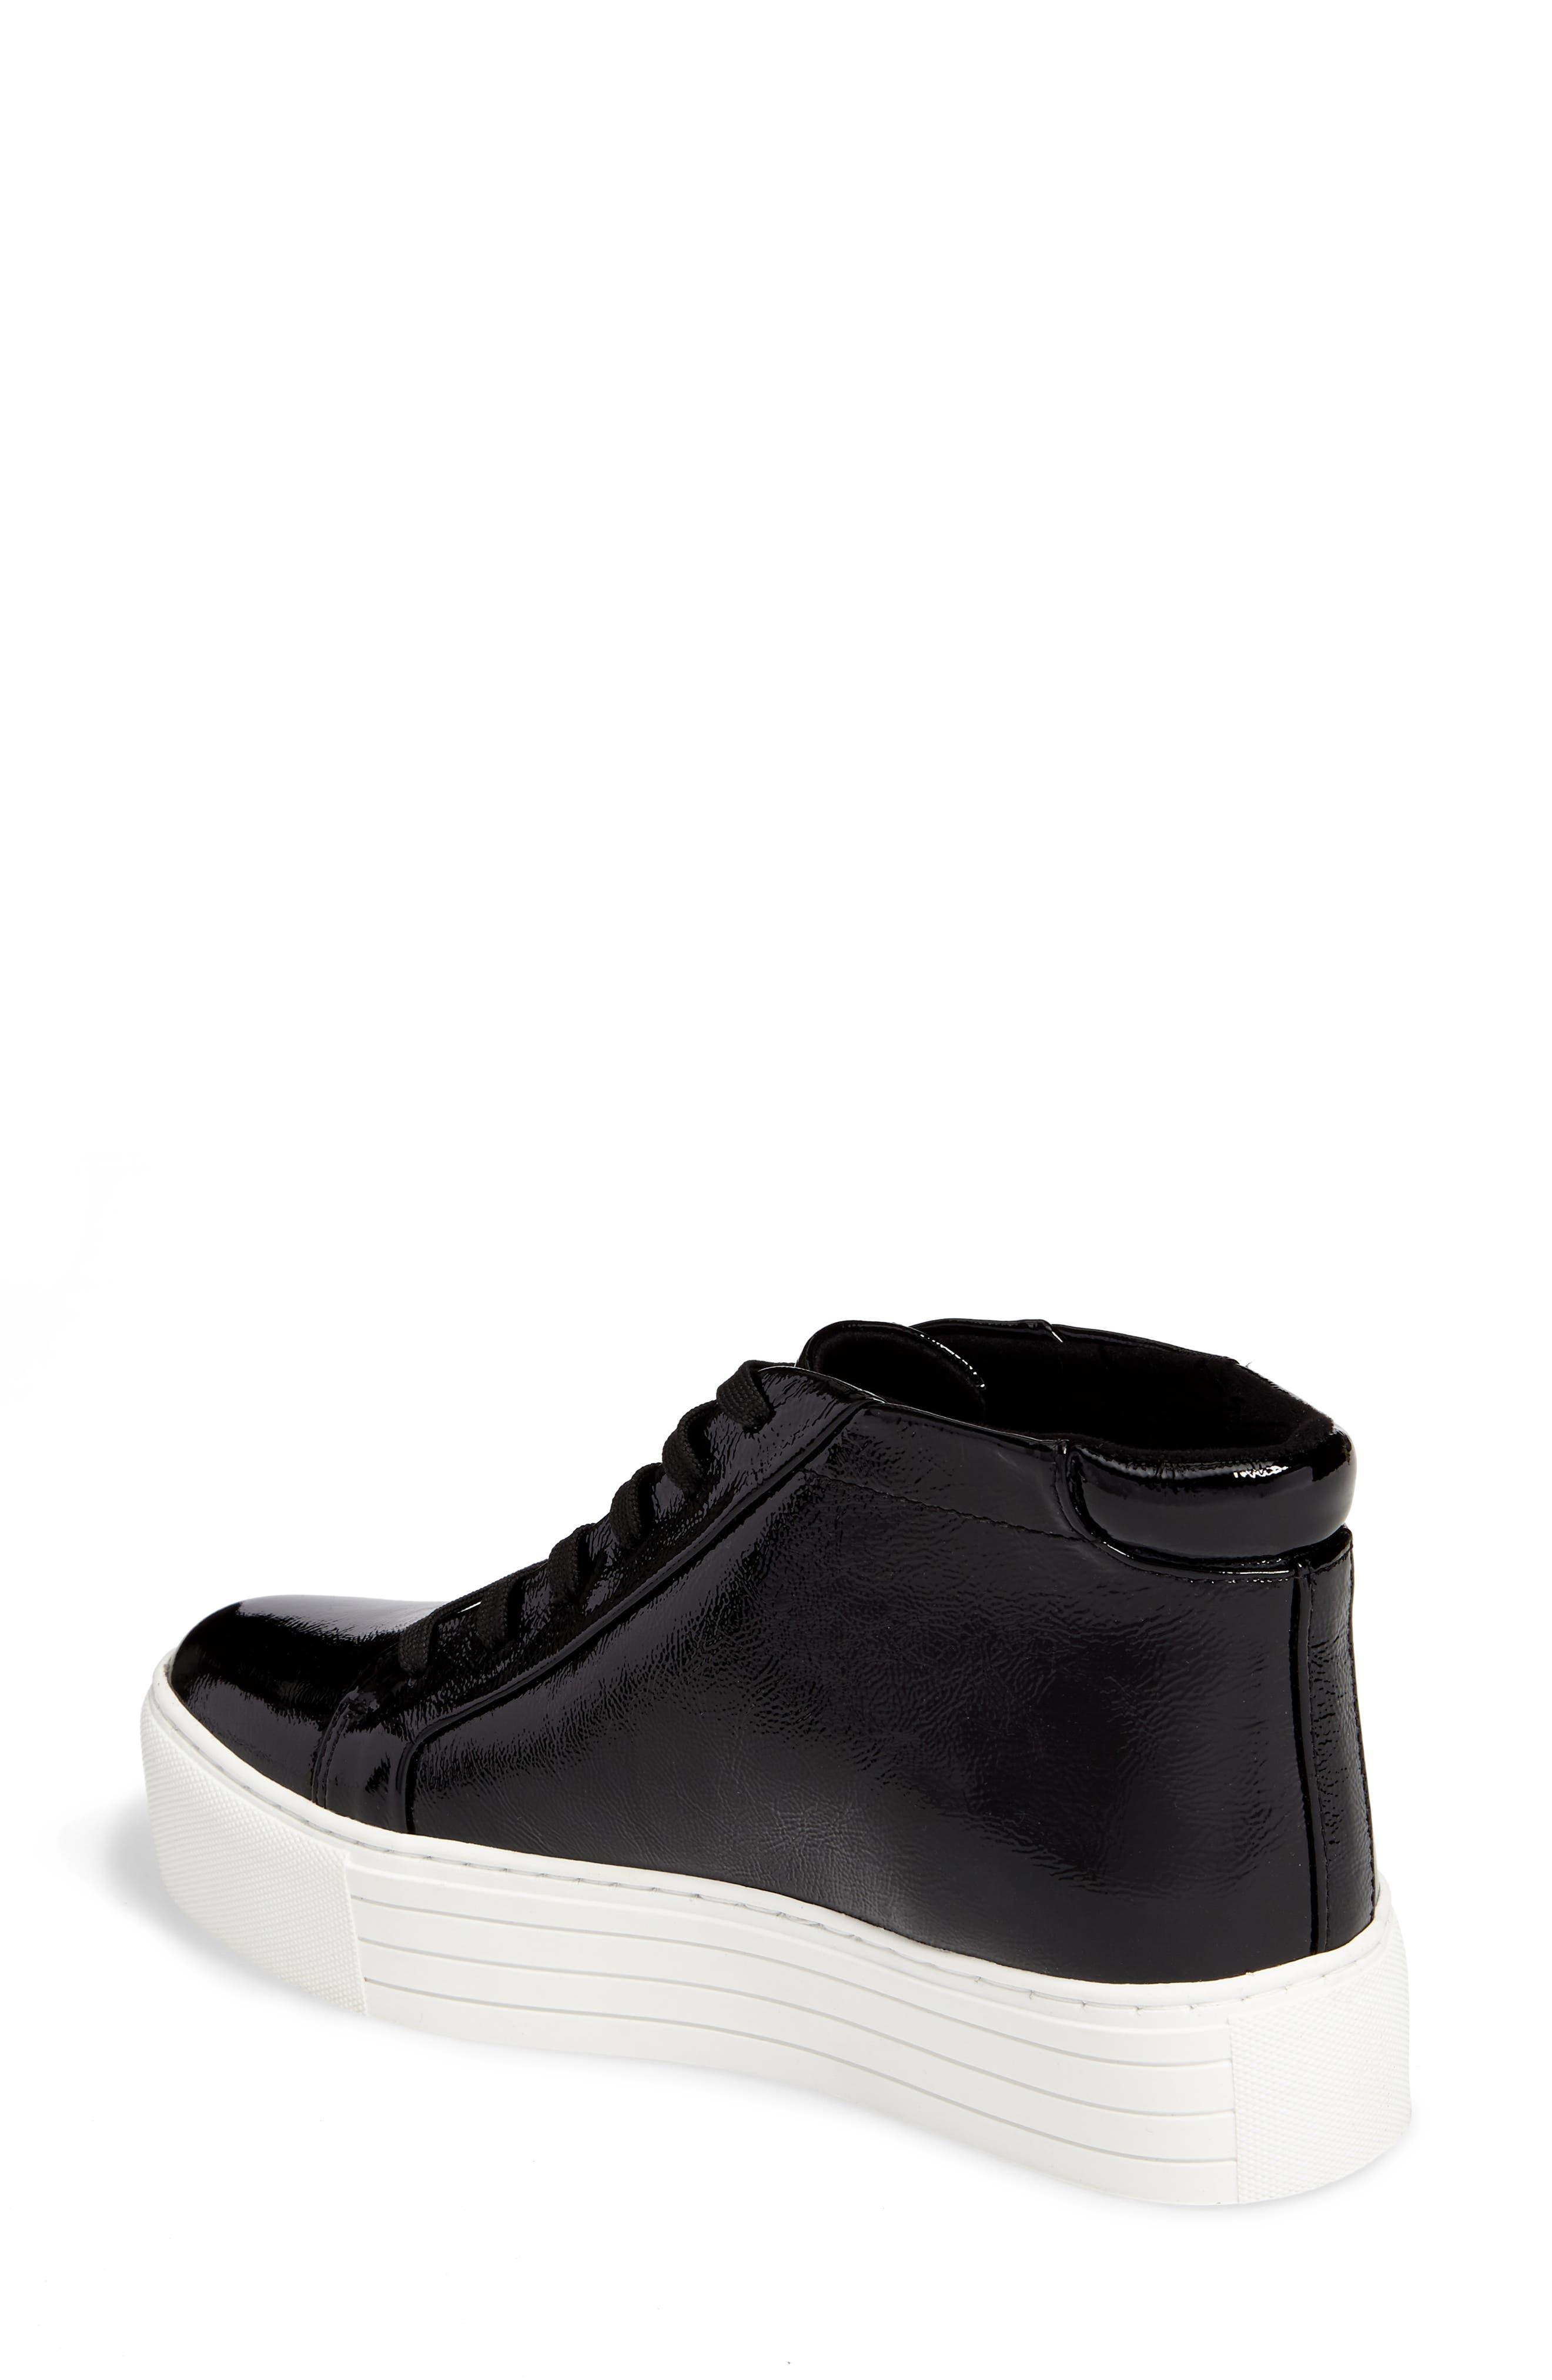 Janette High Top Platform Sneaker,                             Alternate thumbnail 2, color,                             BLACK PATENT LEATHER